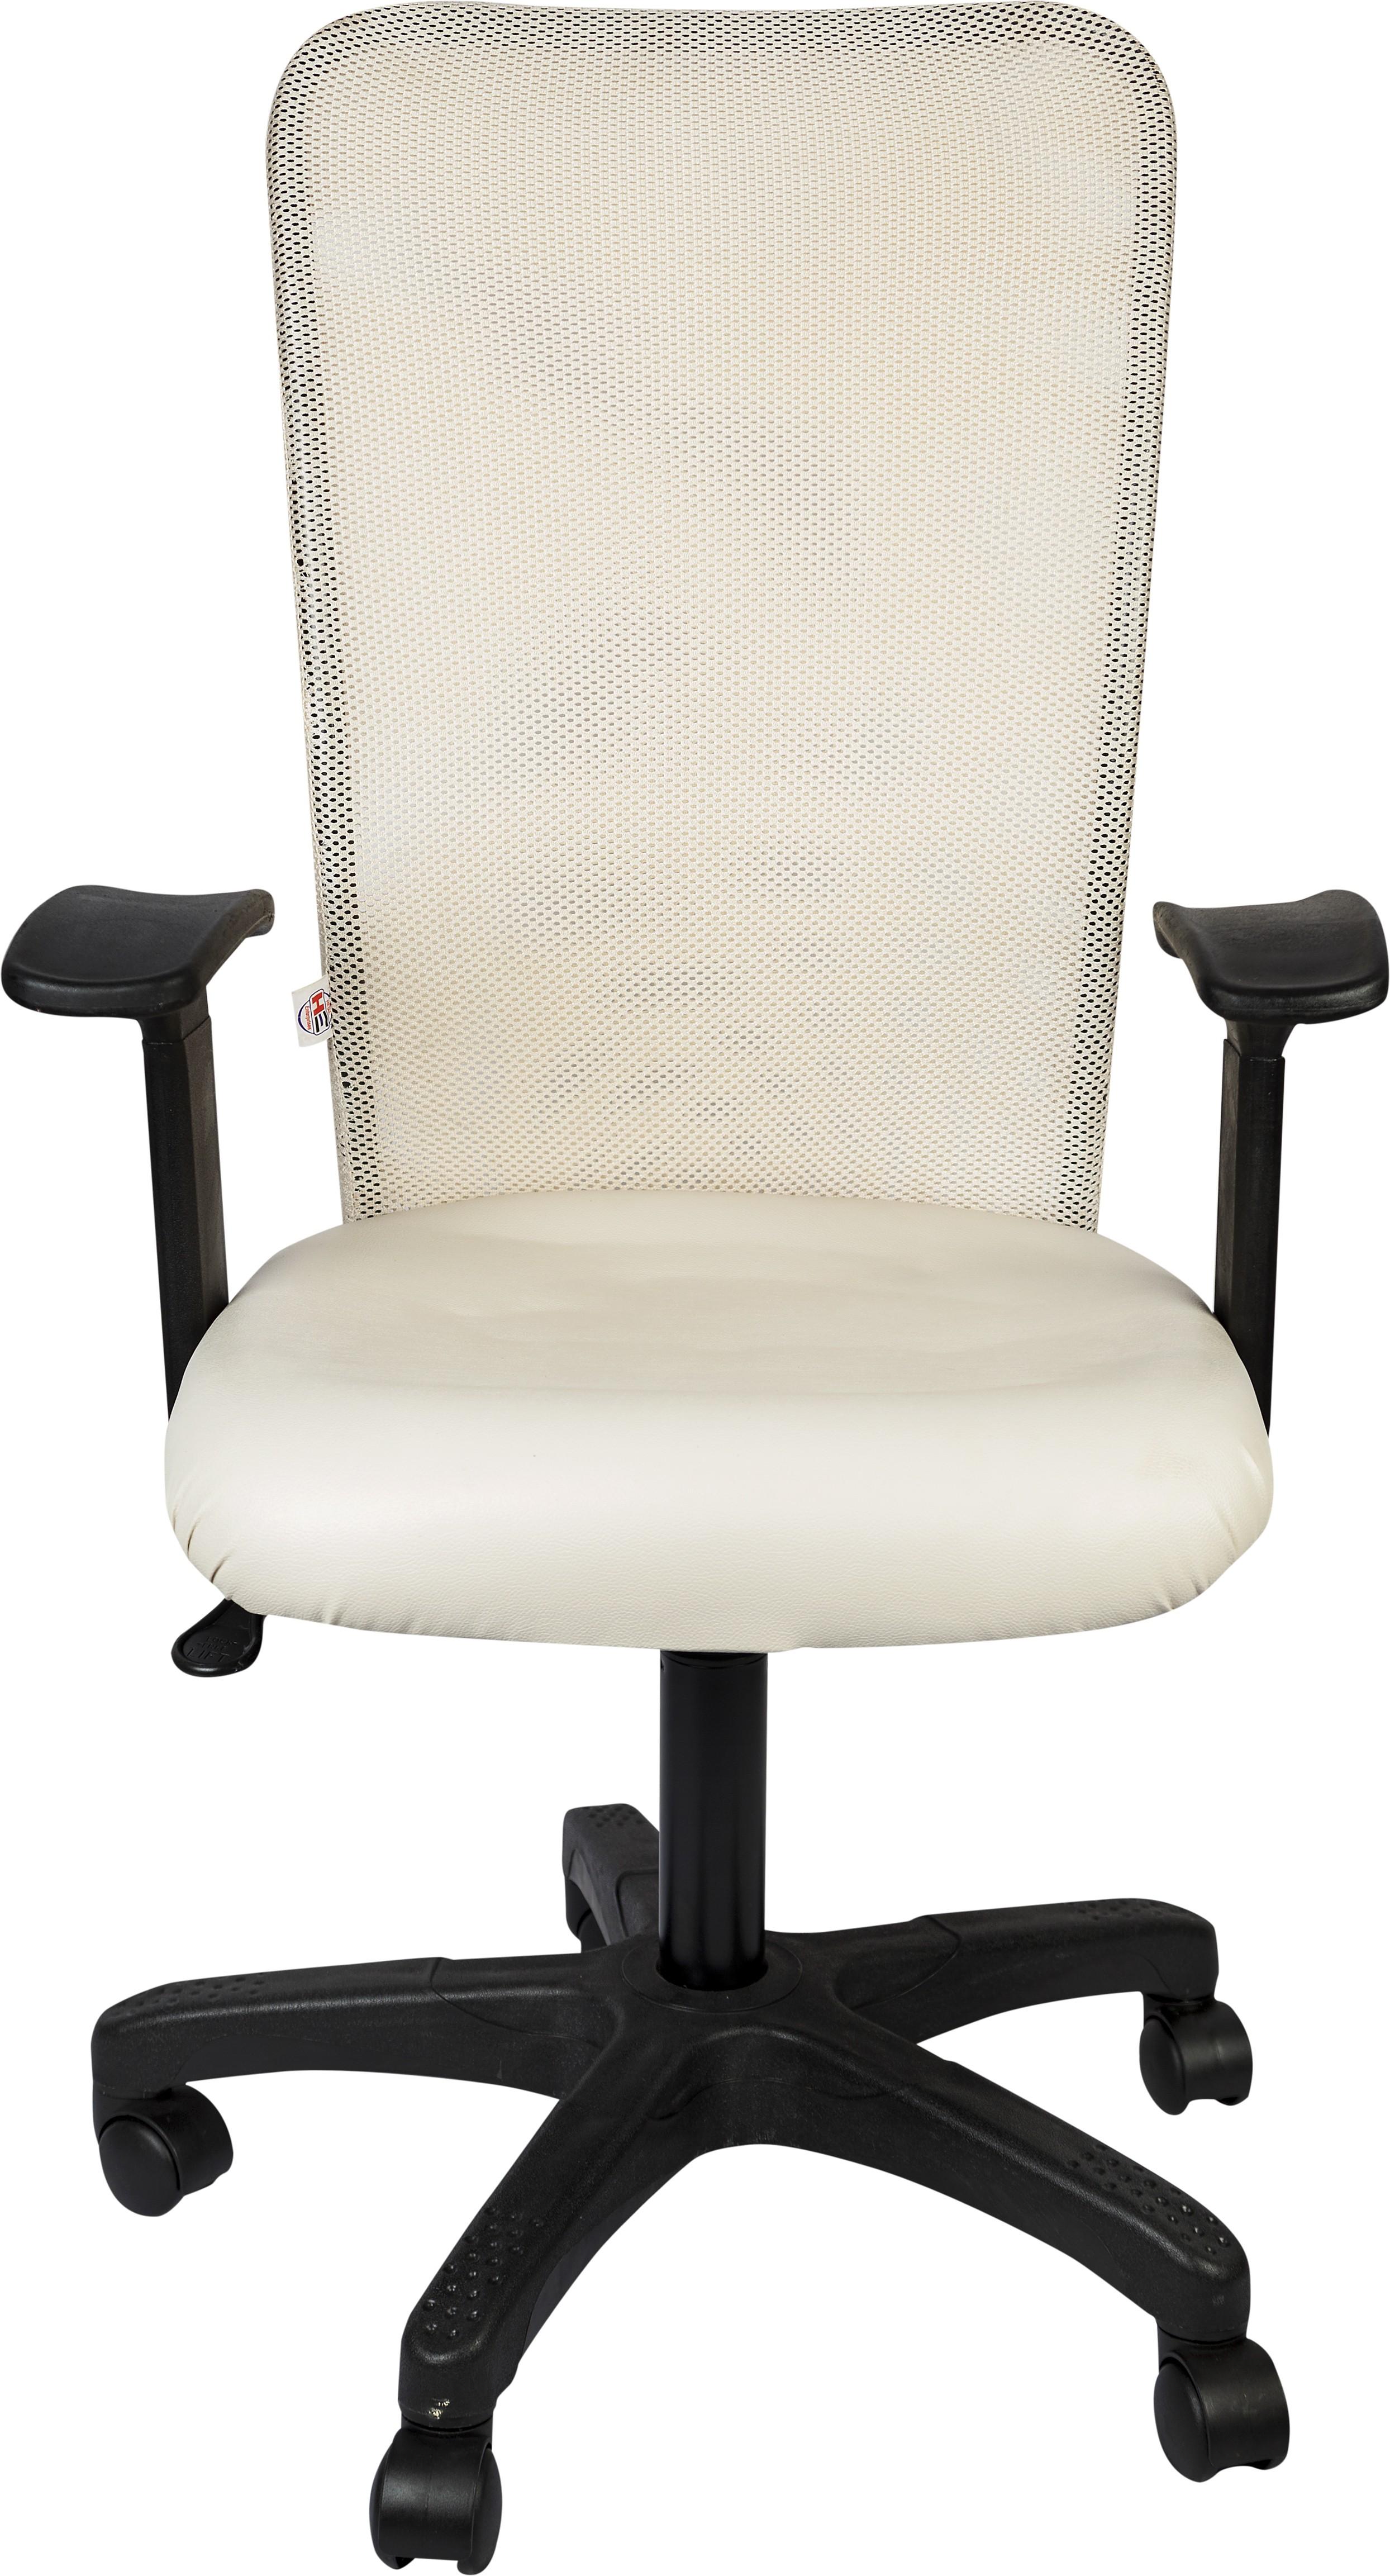 View Hetal Enterprises Fabric Office Chair(Multicolor) Furniture (Hetal Enterprises)